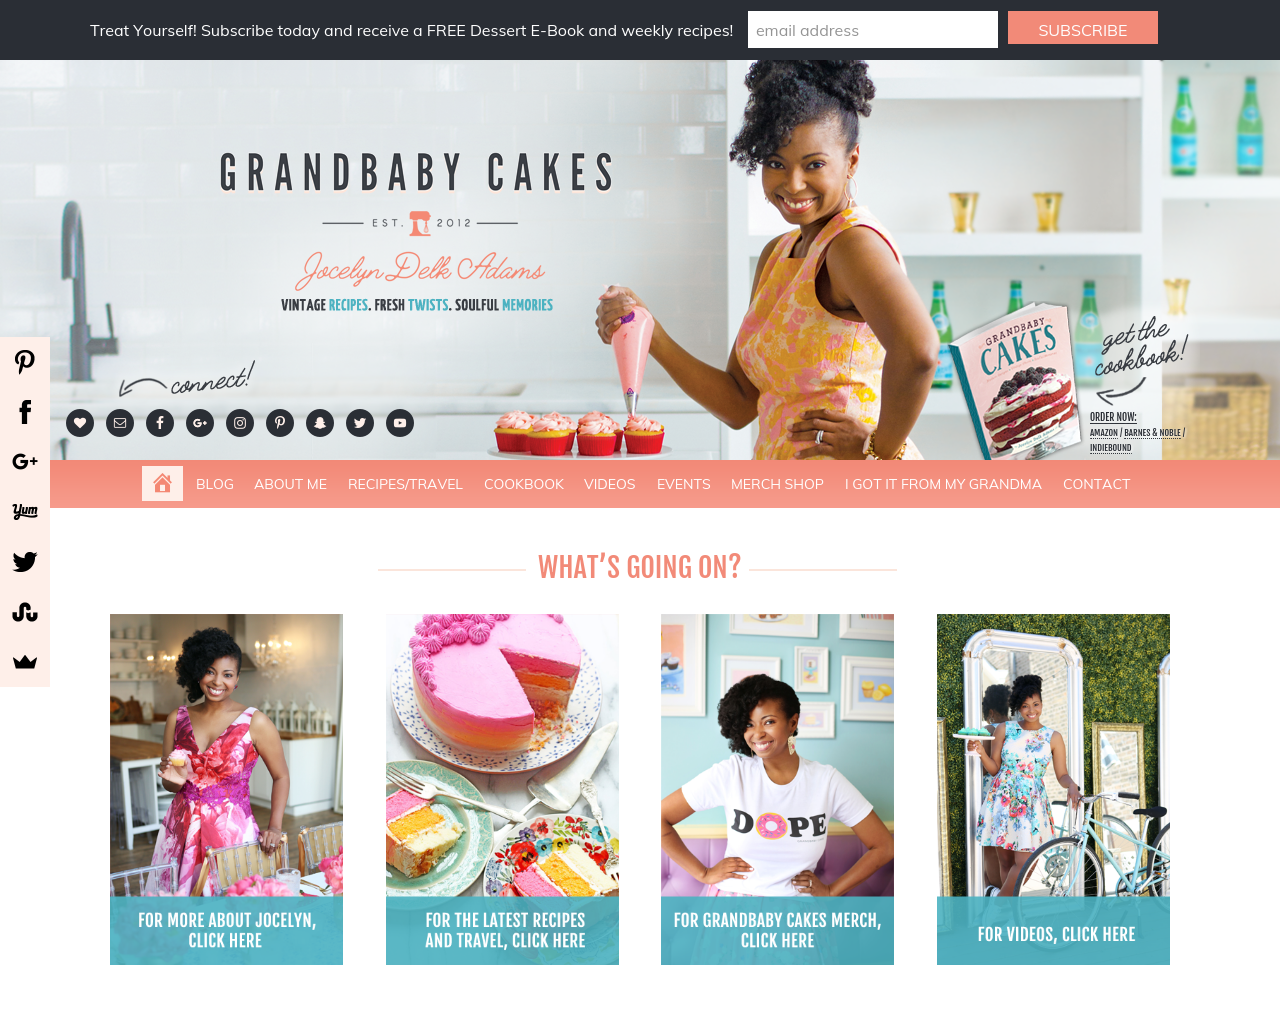 Grandbaby-Cakes-Advertising-Reviews-Pricing